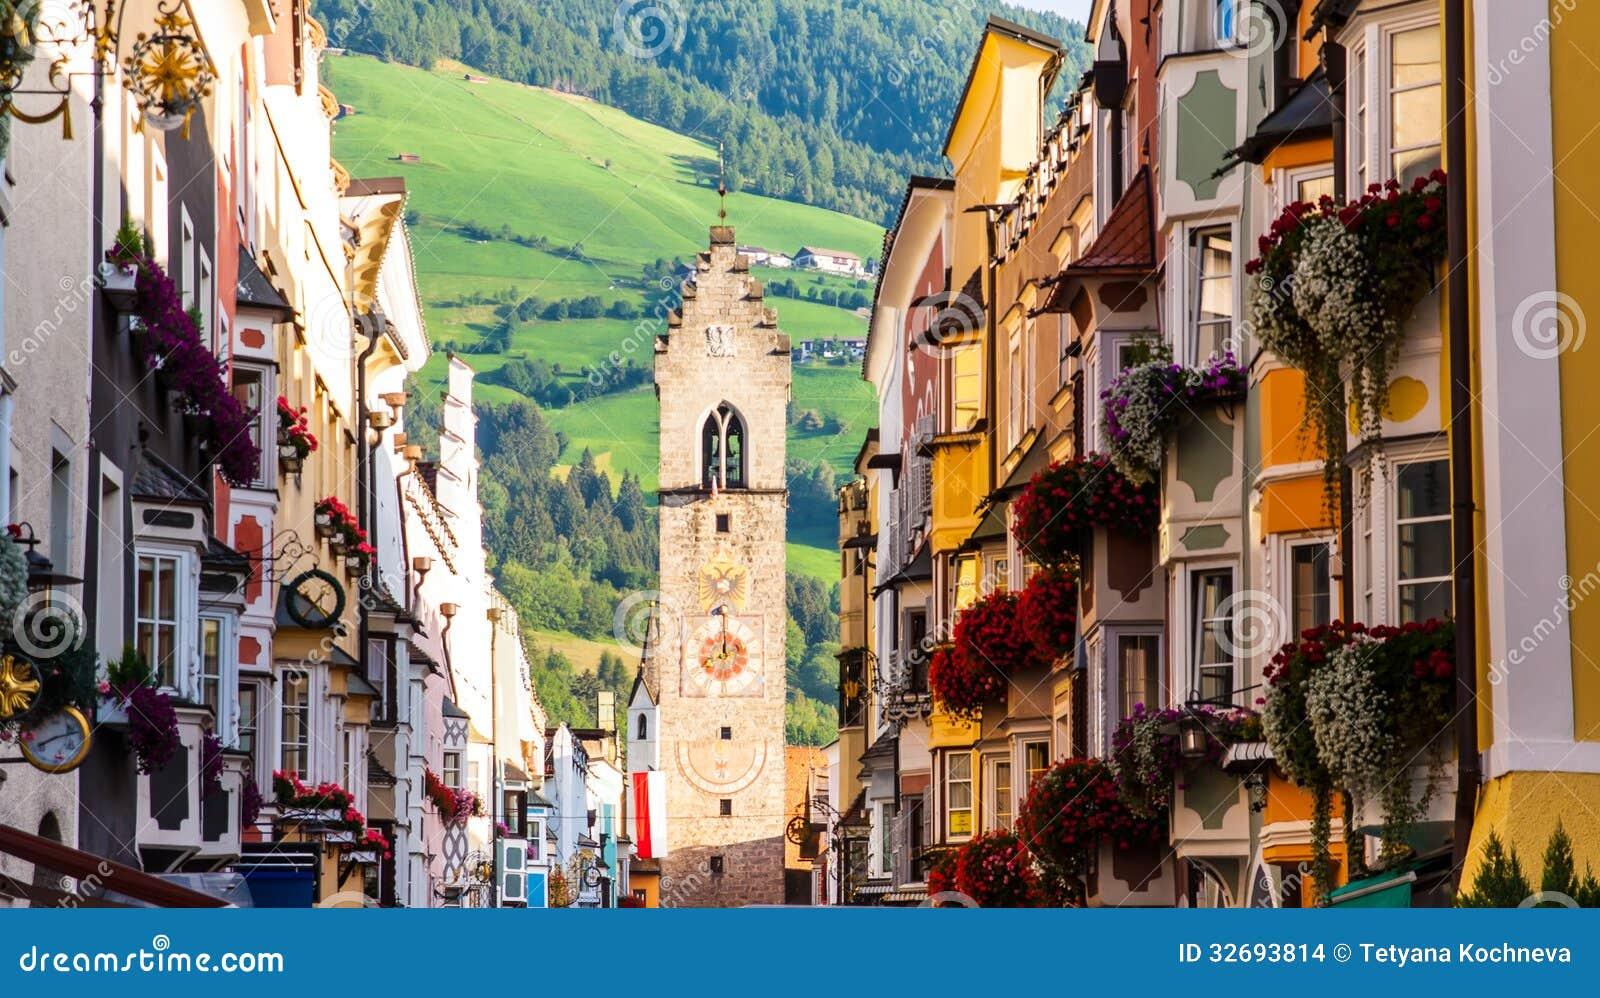 Vipiteno Italy  City pictures : Street Of Old Europian Town Vipiteno, Italy Stock Images Image ...